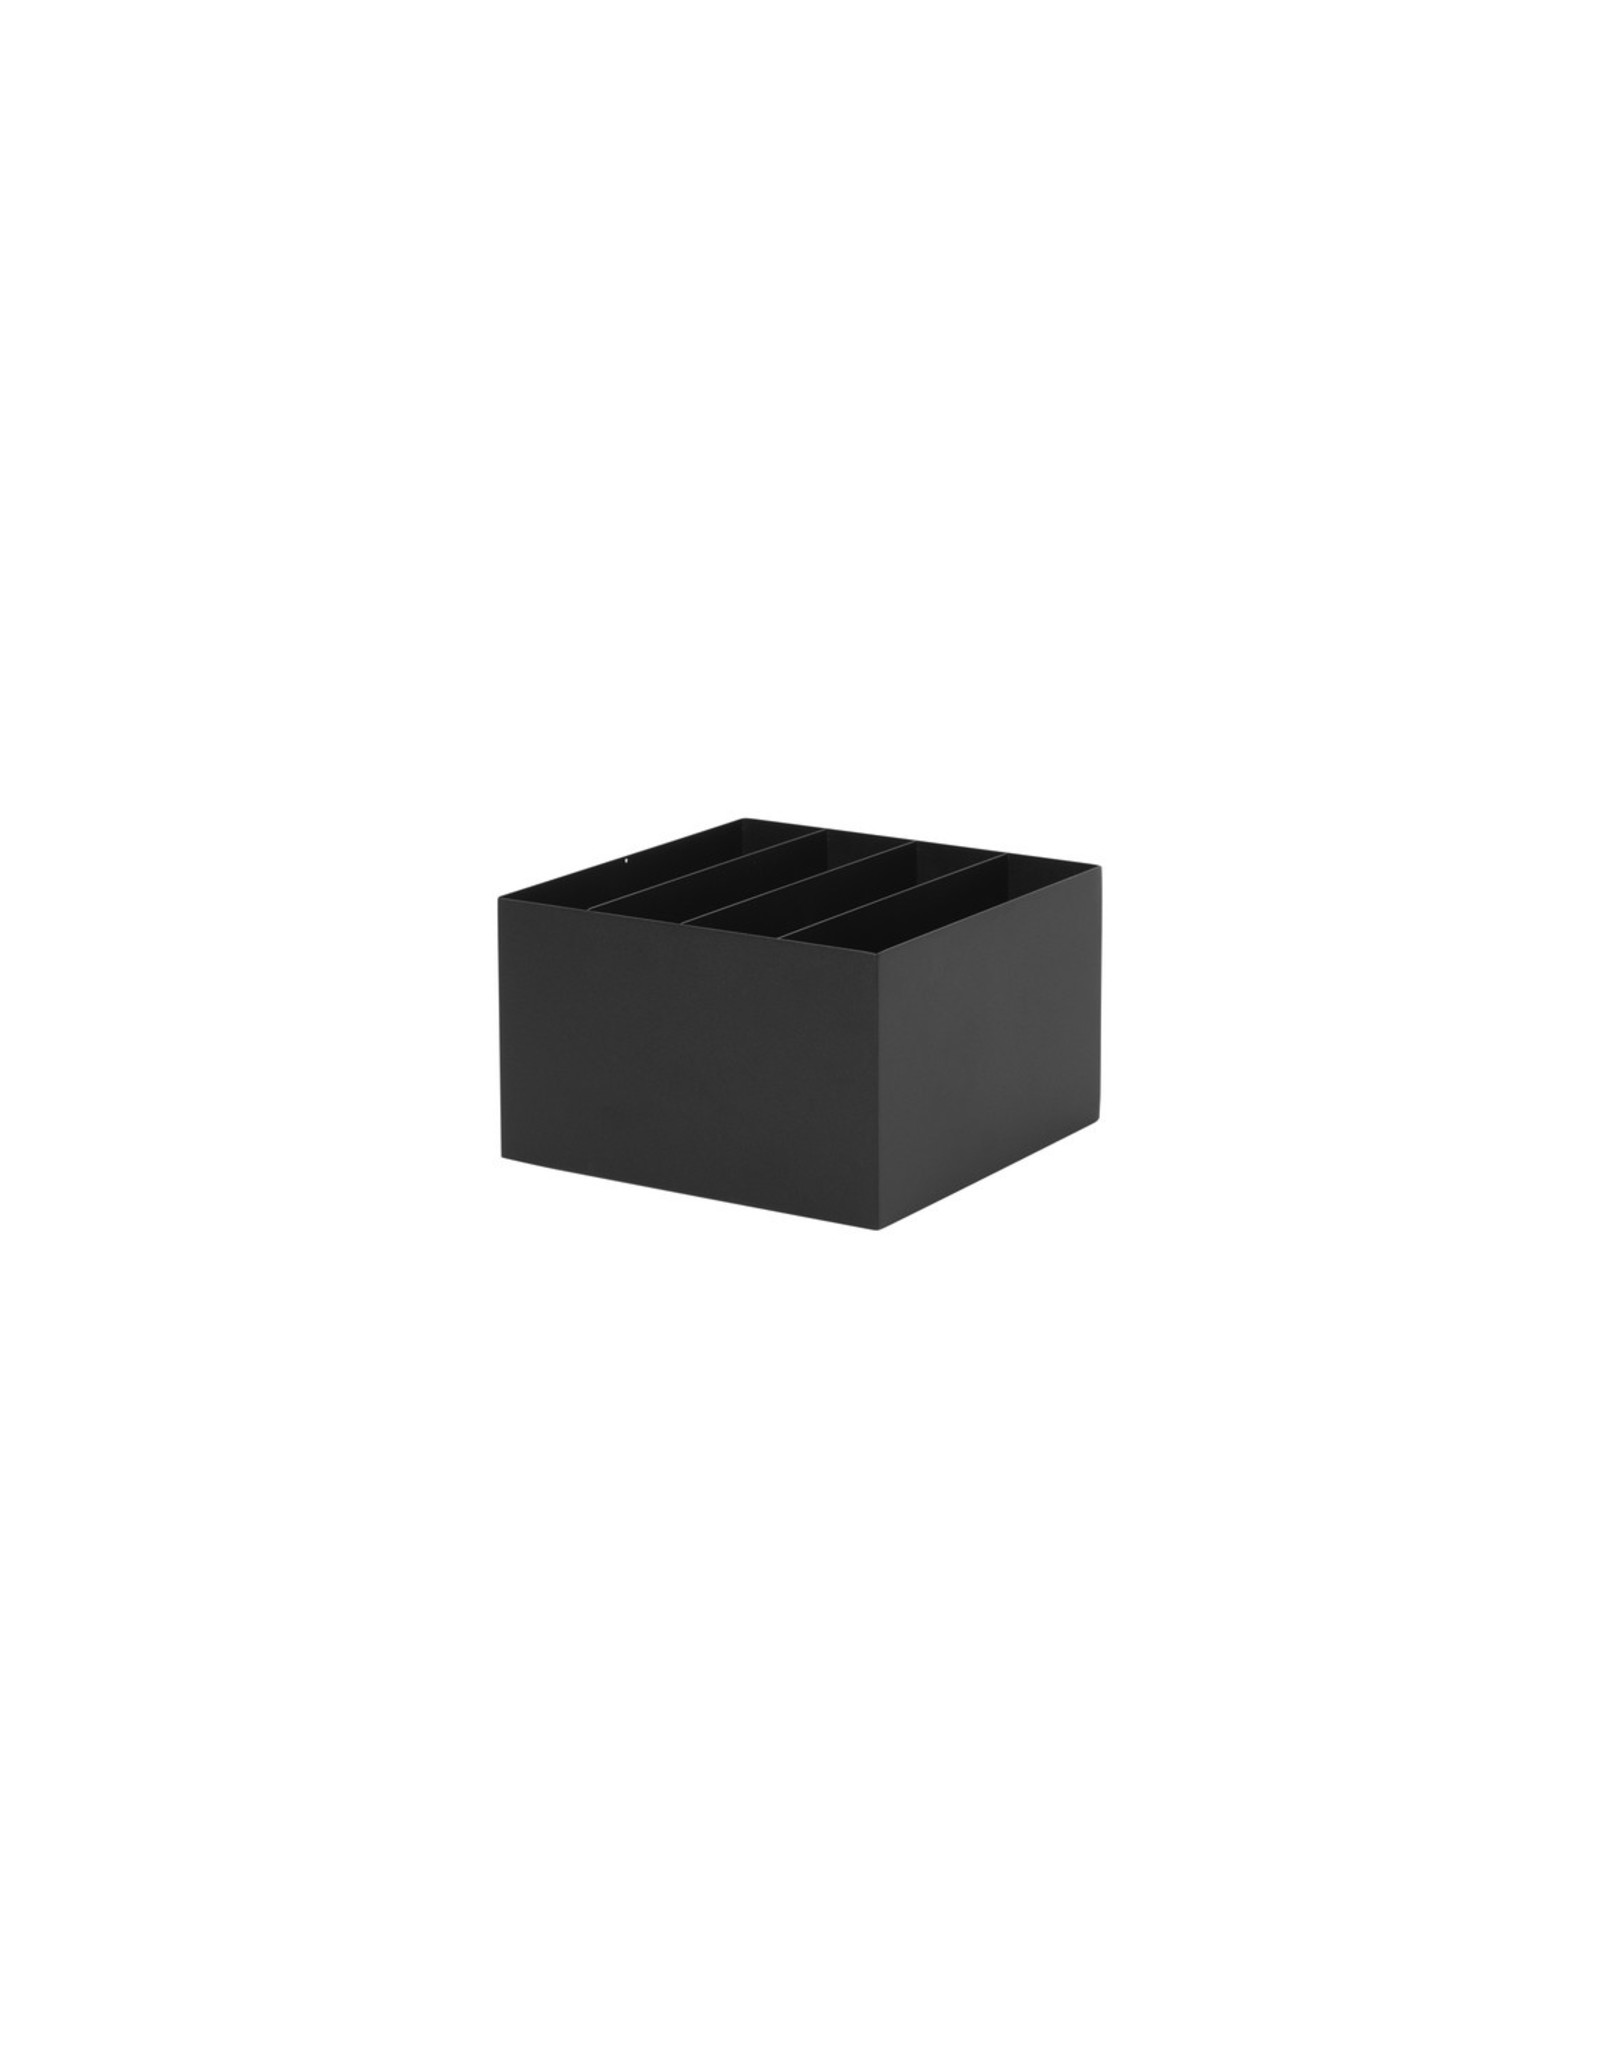 Ferm LIVING ferm LIVING Plant Box Divider Black